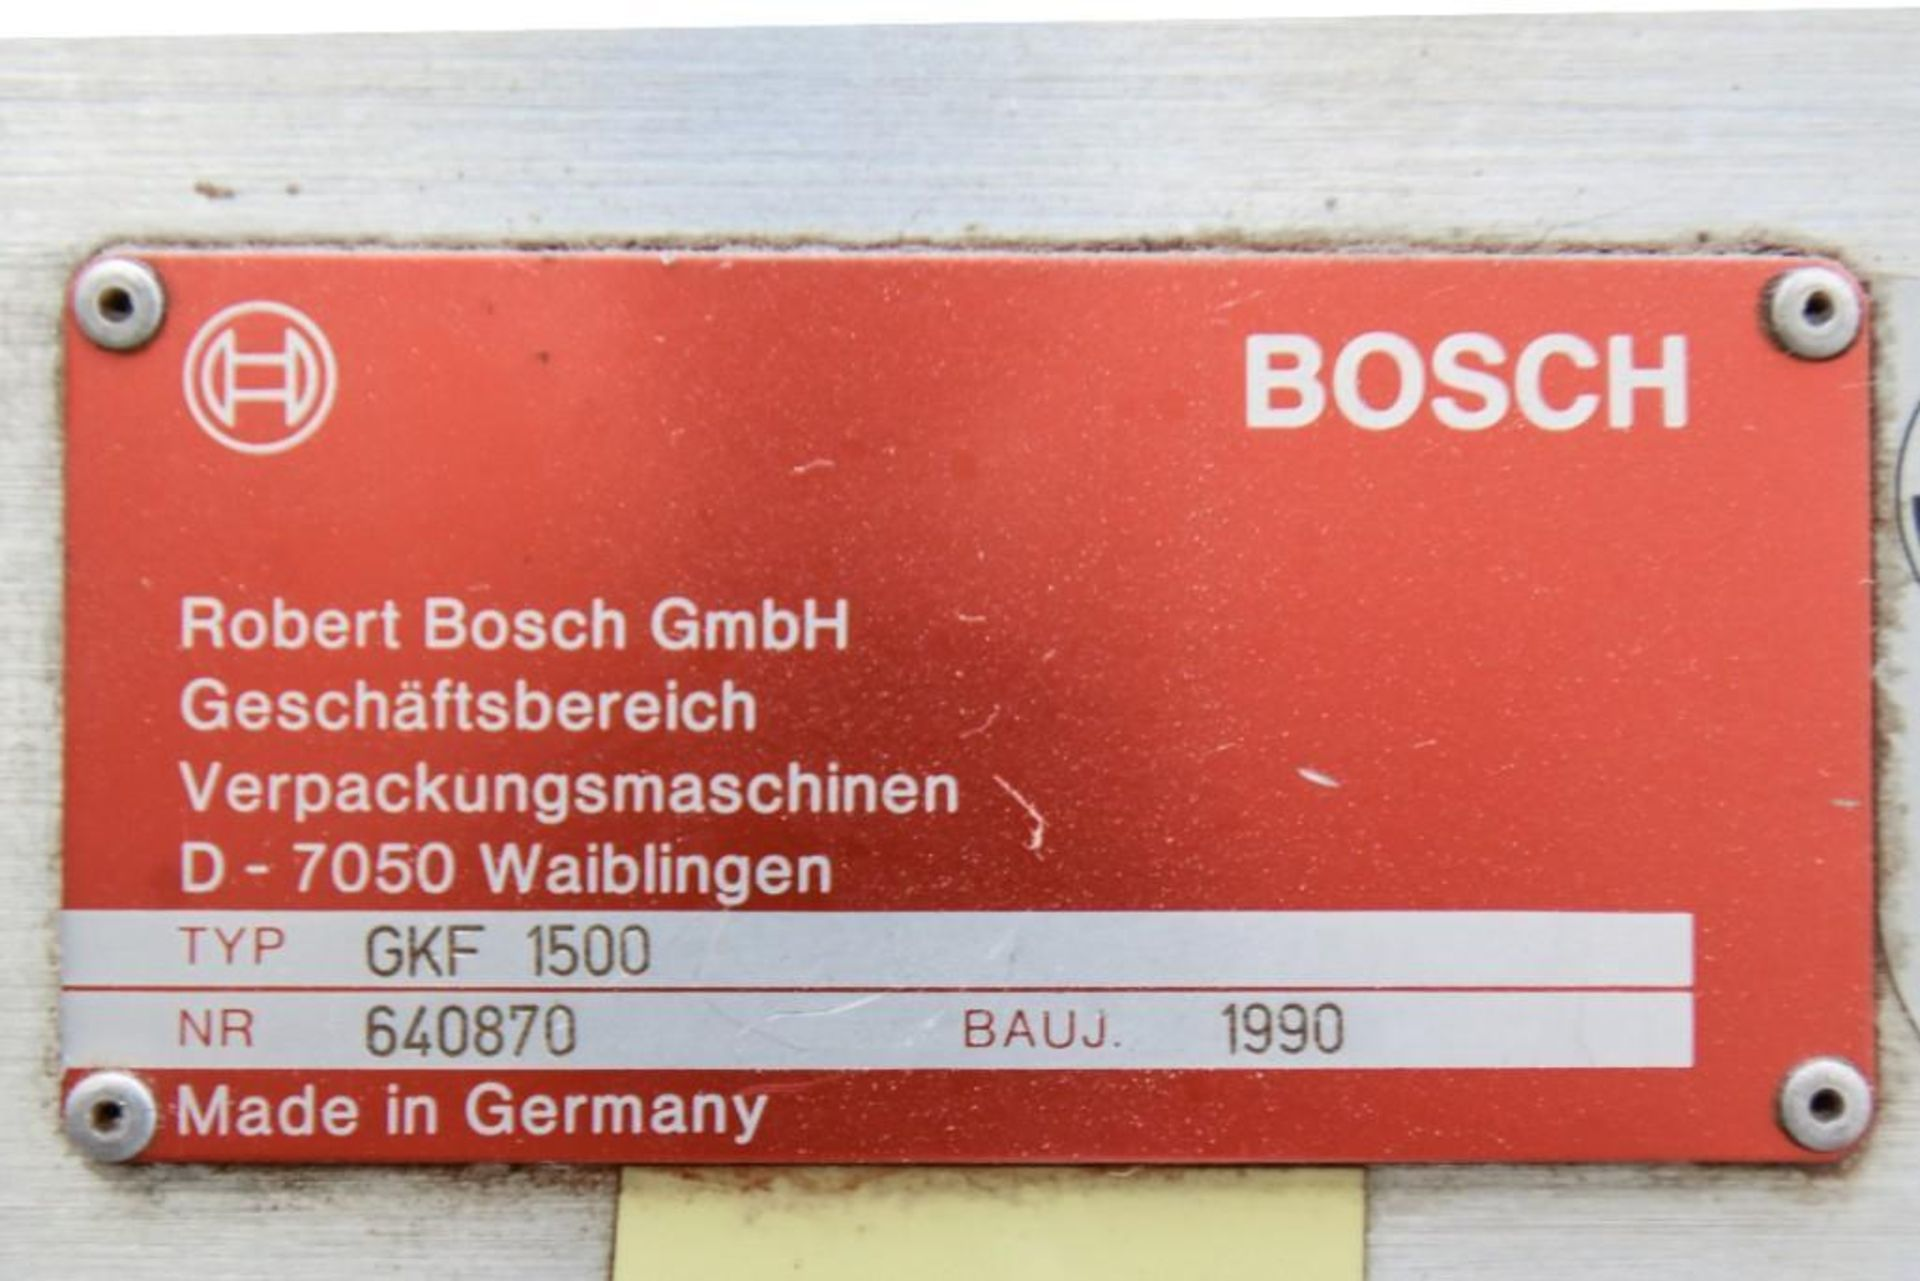 Bosch 1500 Encapsulation Machine - Image 10 of 11